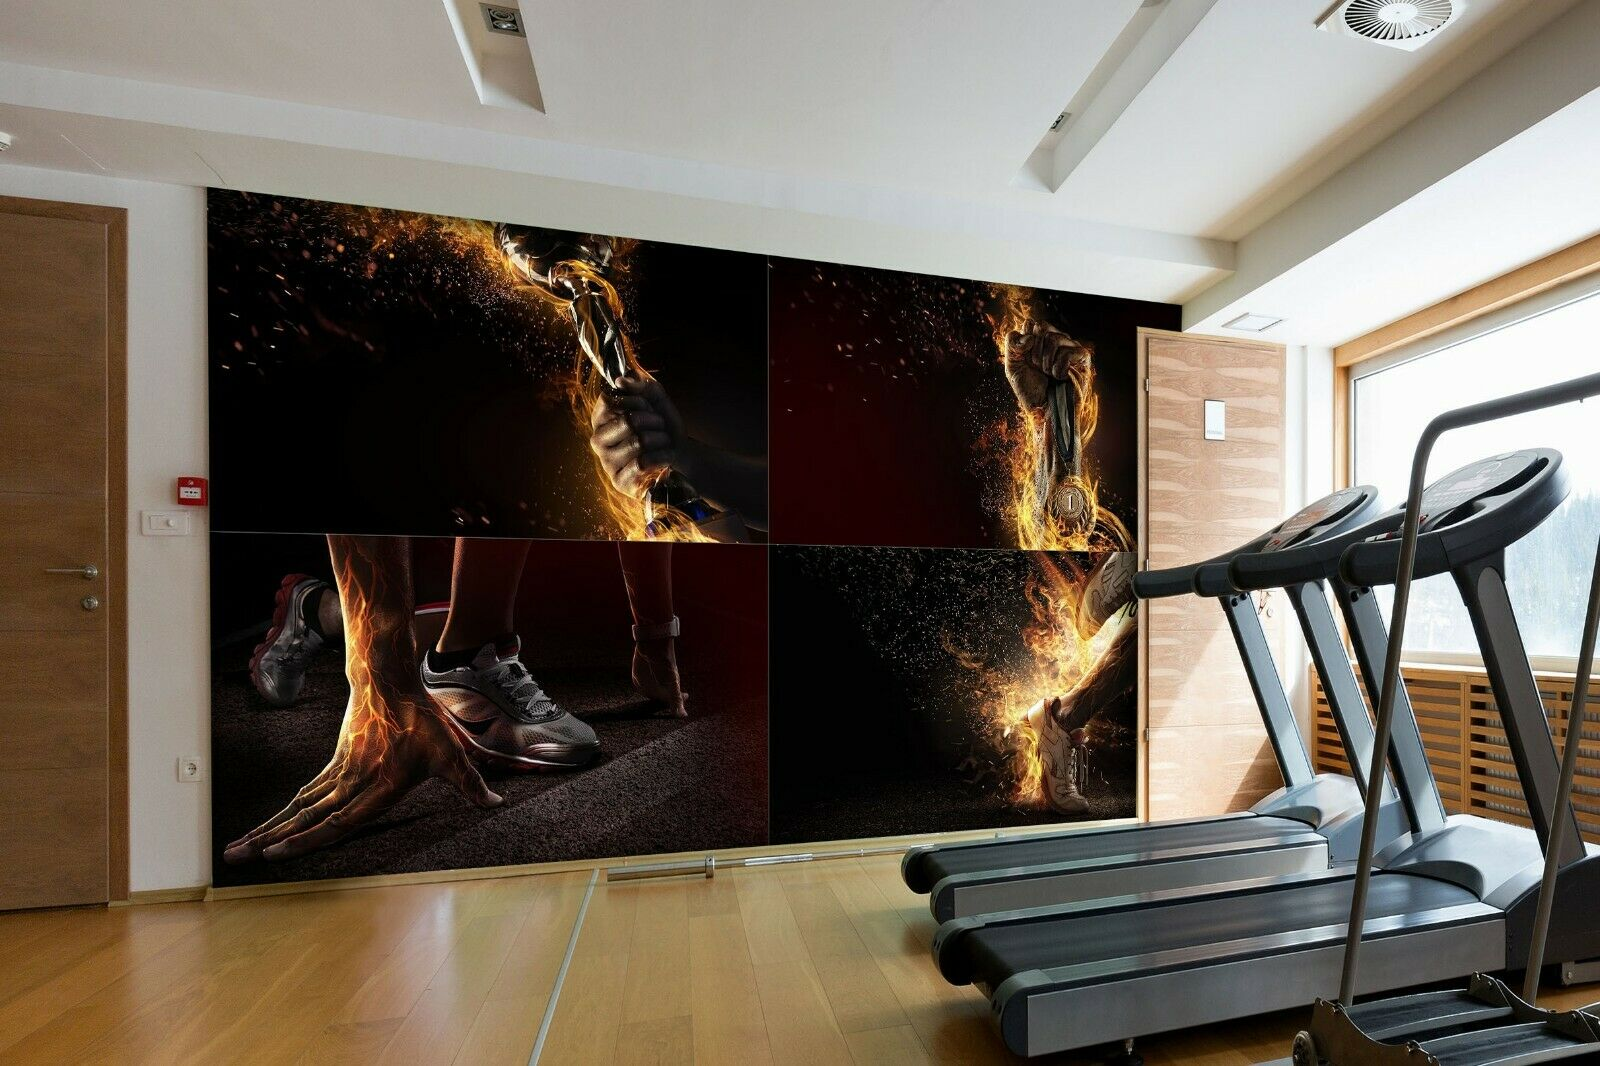 3D Fitness schuhe R52 Business Wallpaper Wall Mural Self-adhesive Commerce An